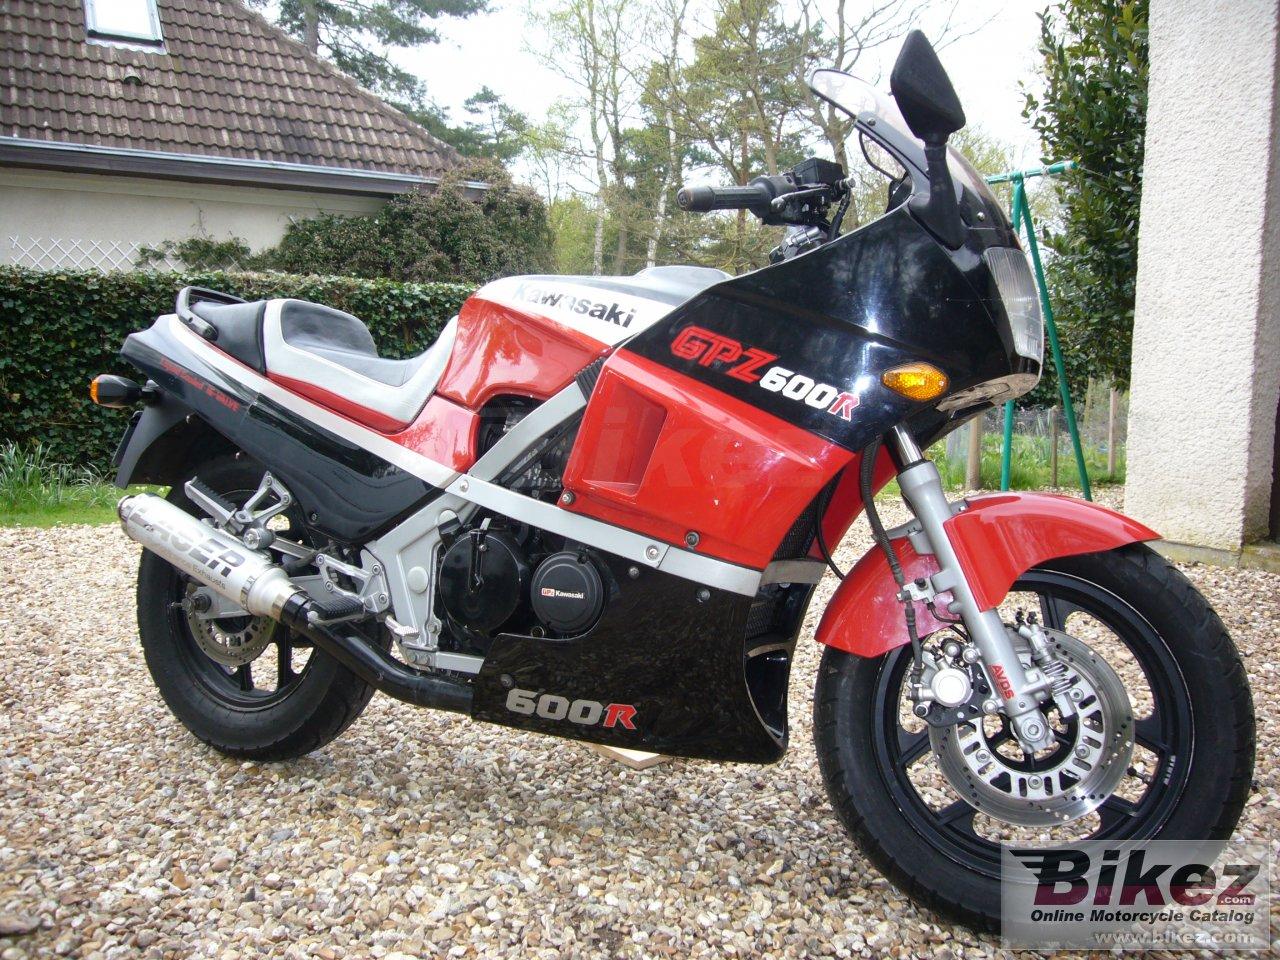 Kawasaki Gpx  For Sale